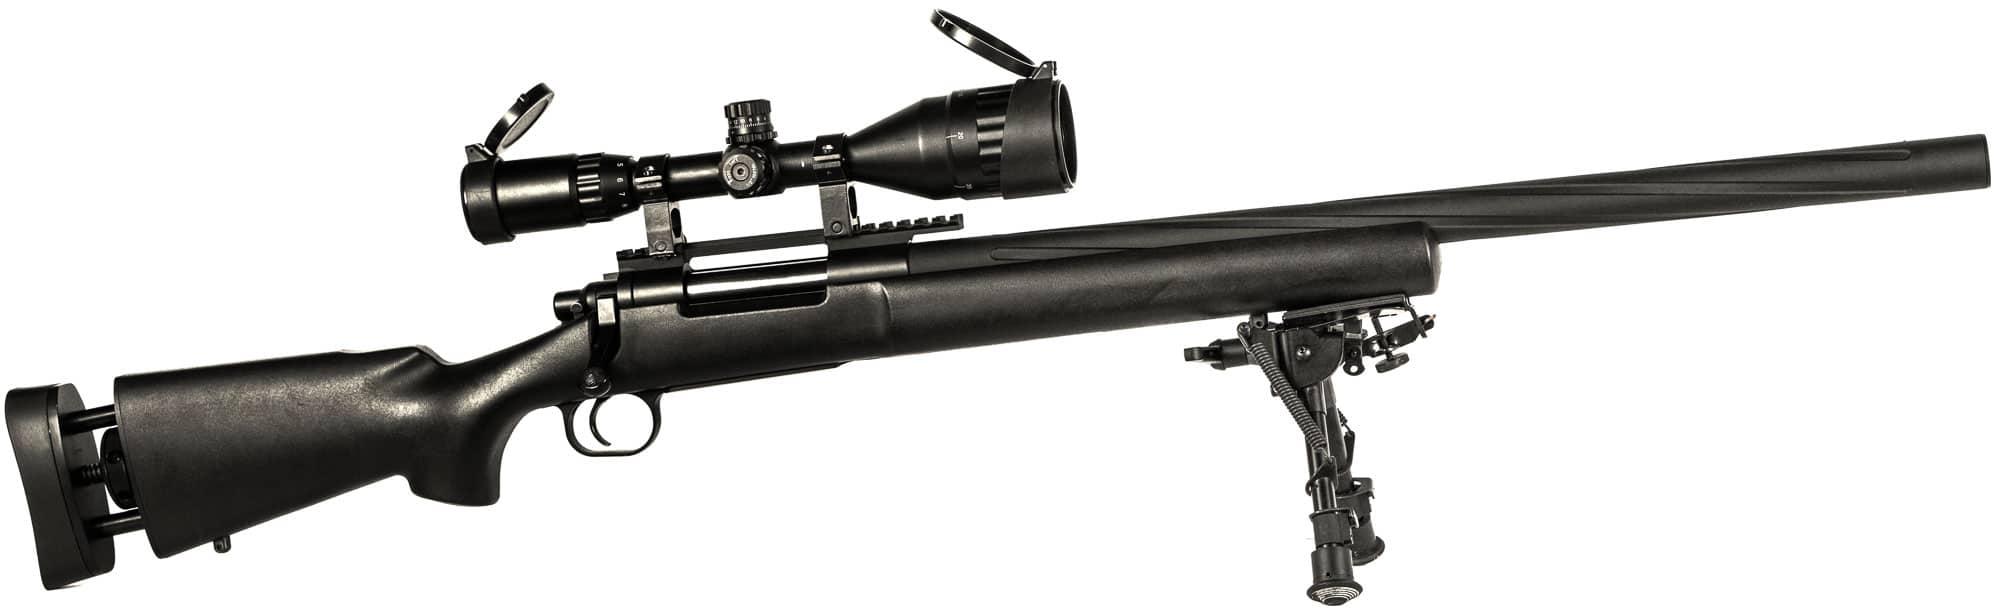 Novritsch SSG24 Airsoft Sniper Rifle – PREORDER ...